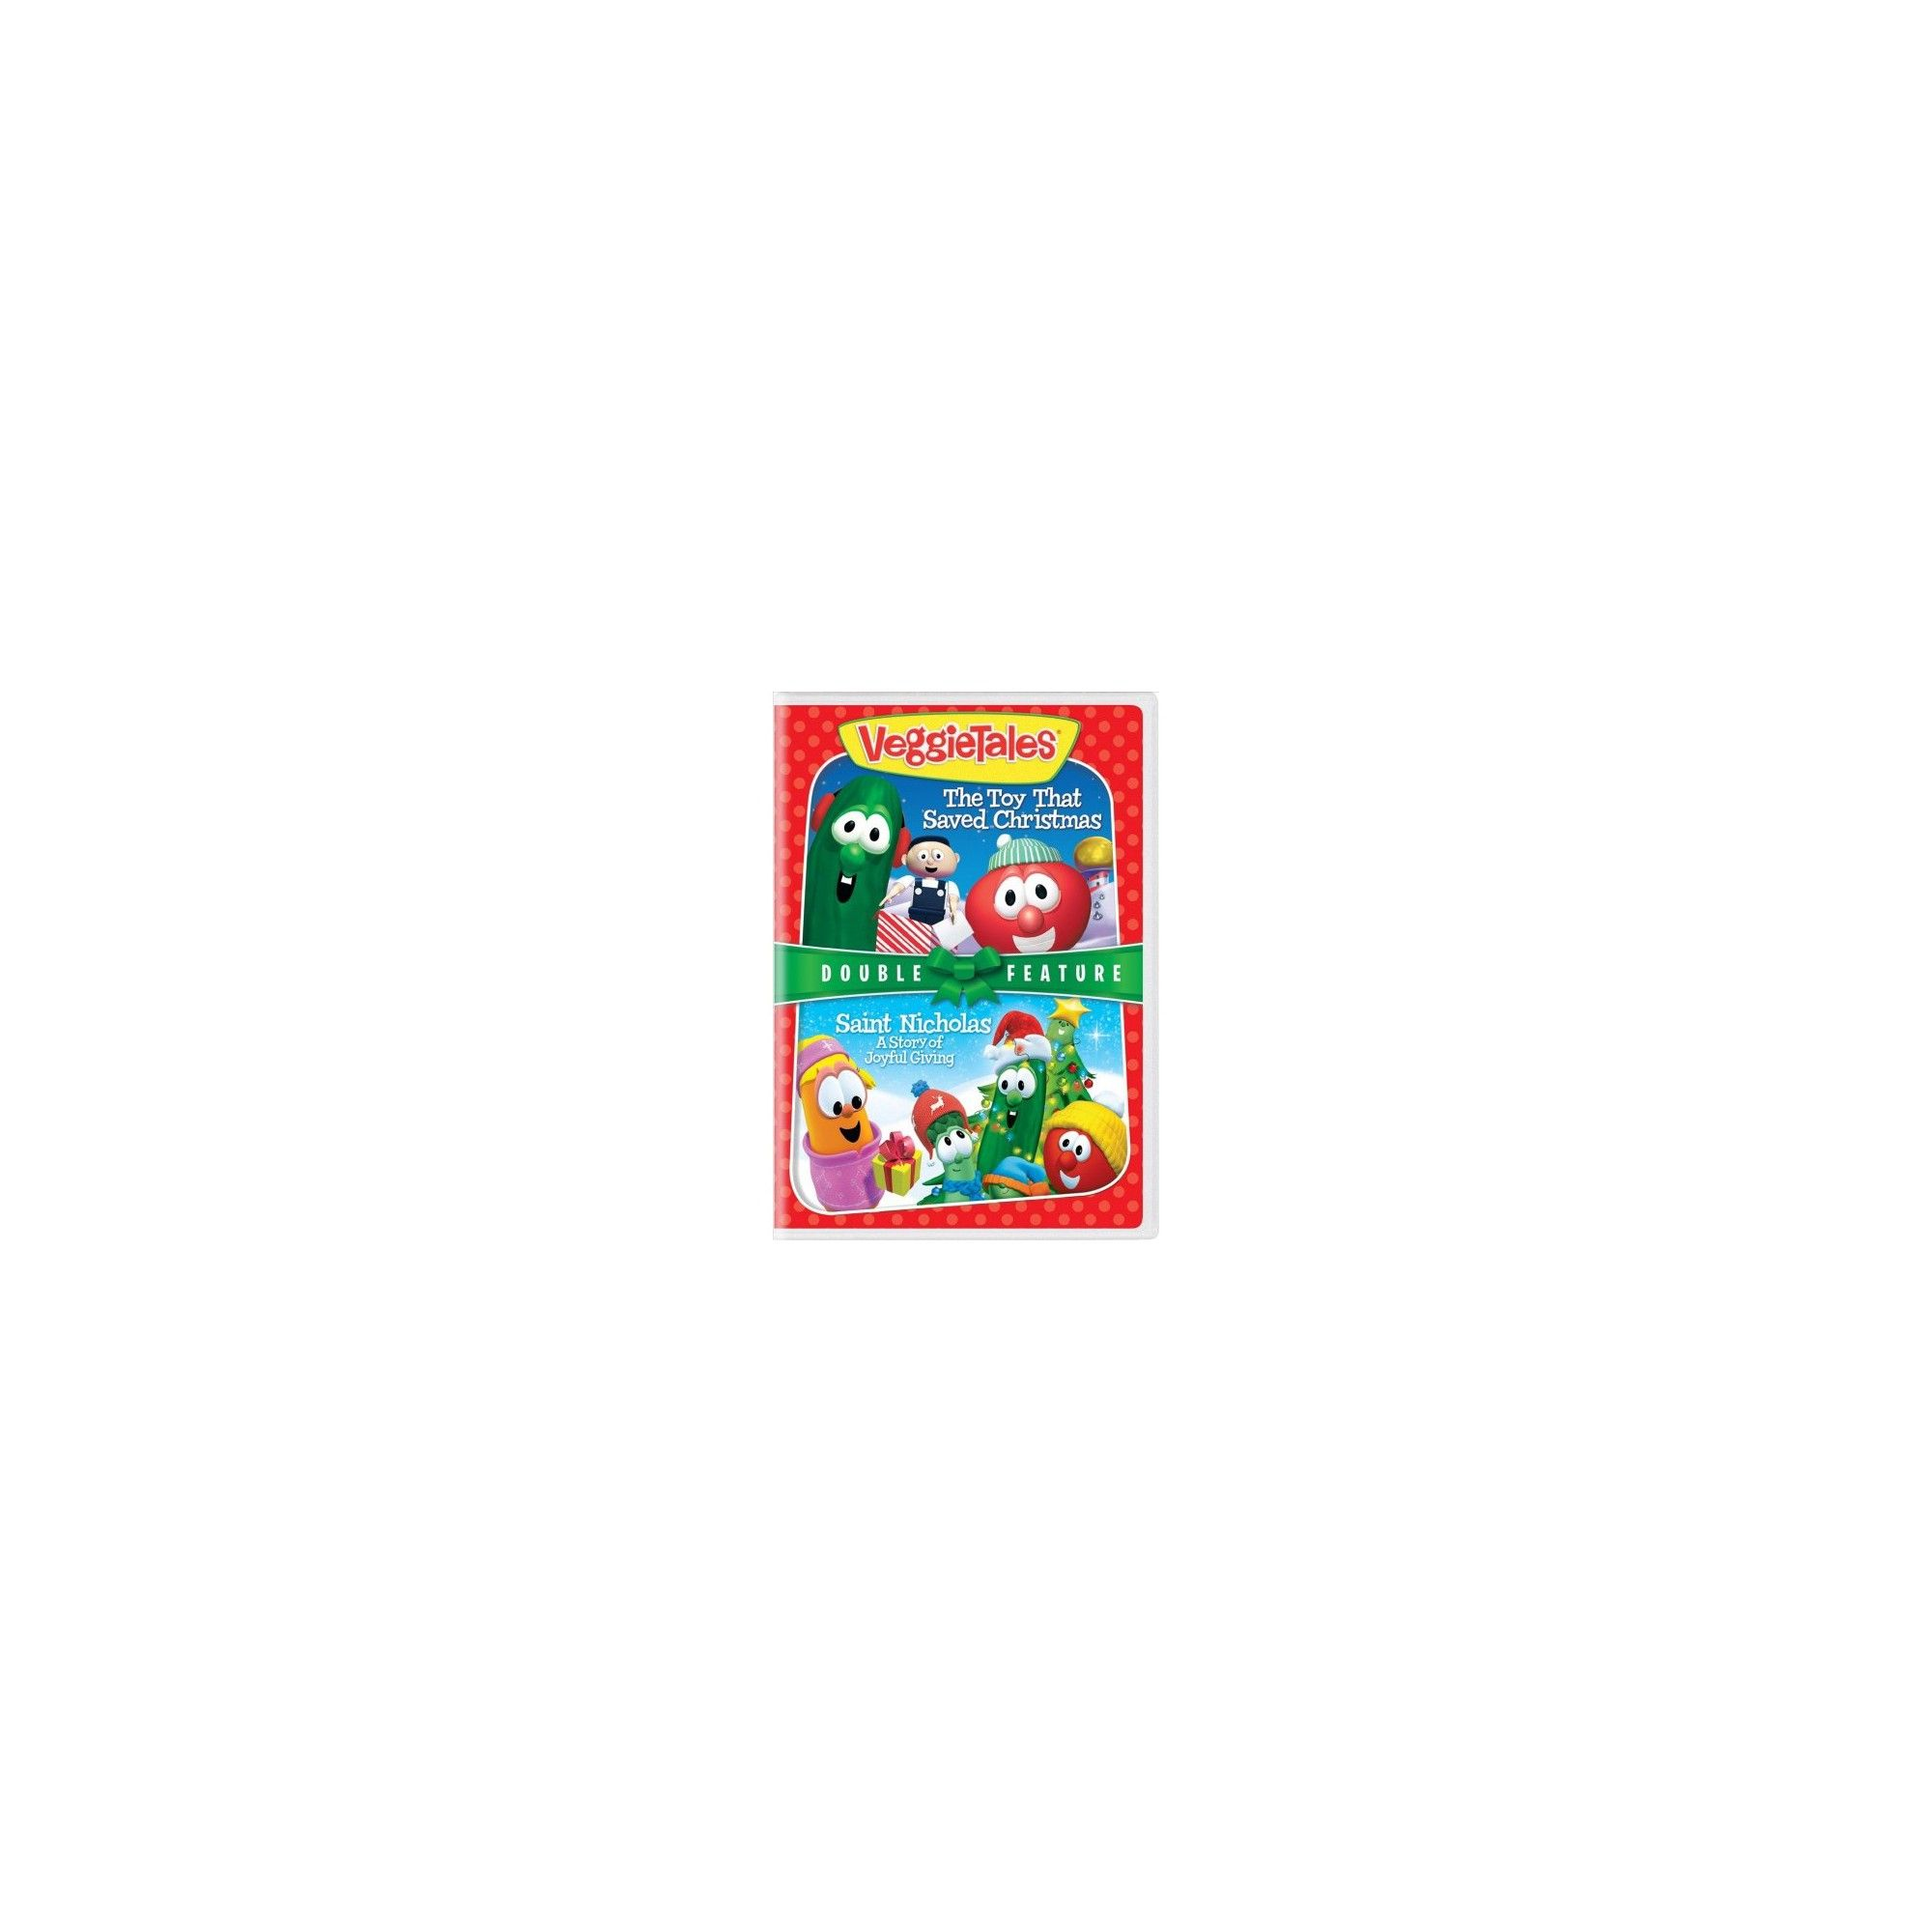 Veggie Tales The Toy That Saved Christmas St Nicholas Dvd Veggietales Veggie Tales Holiday Toys